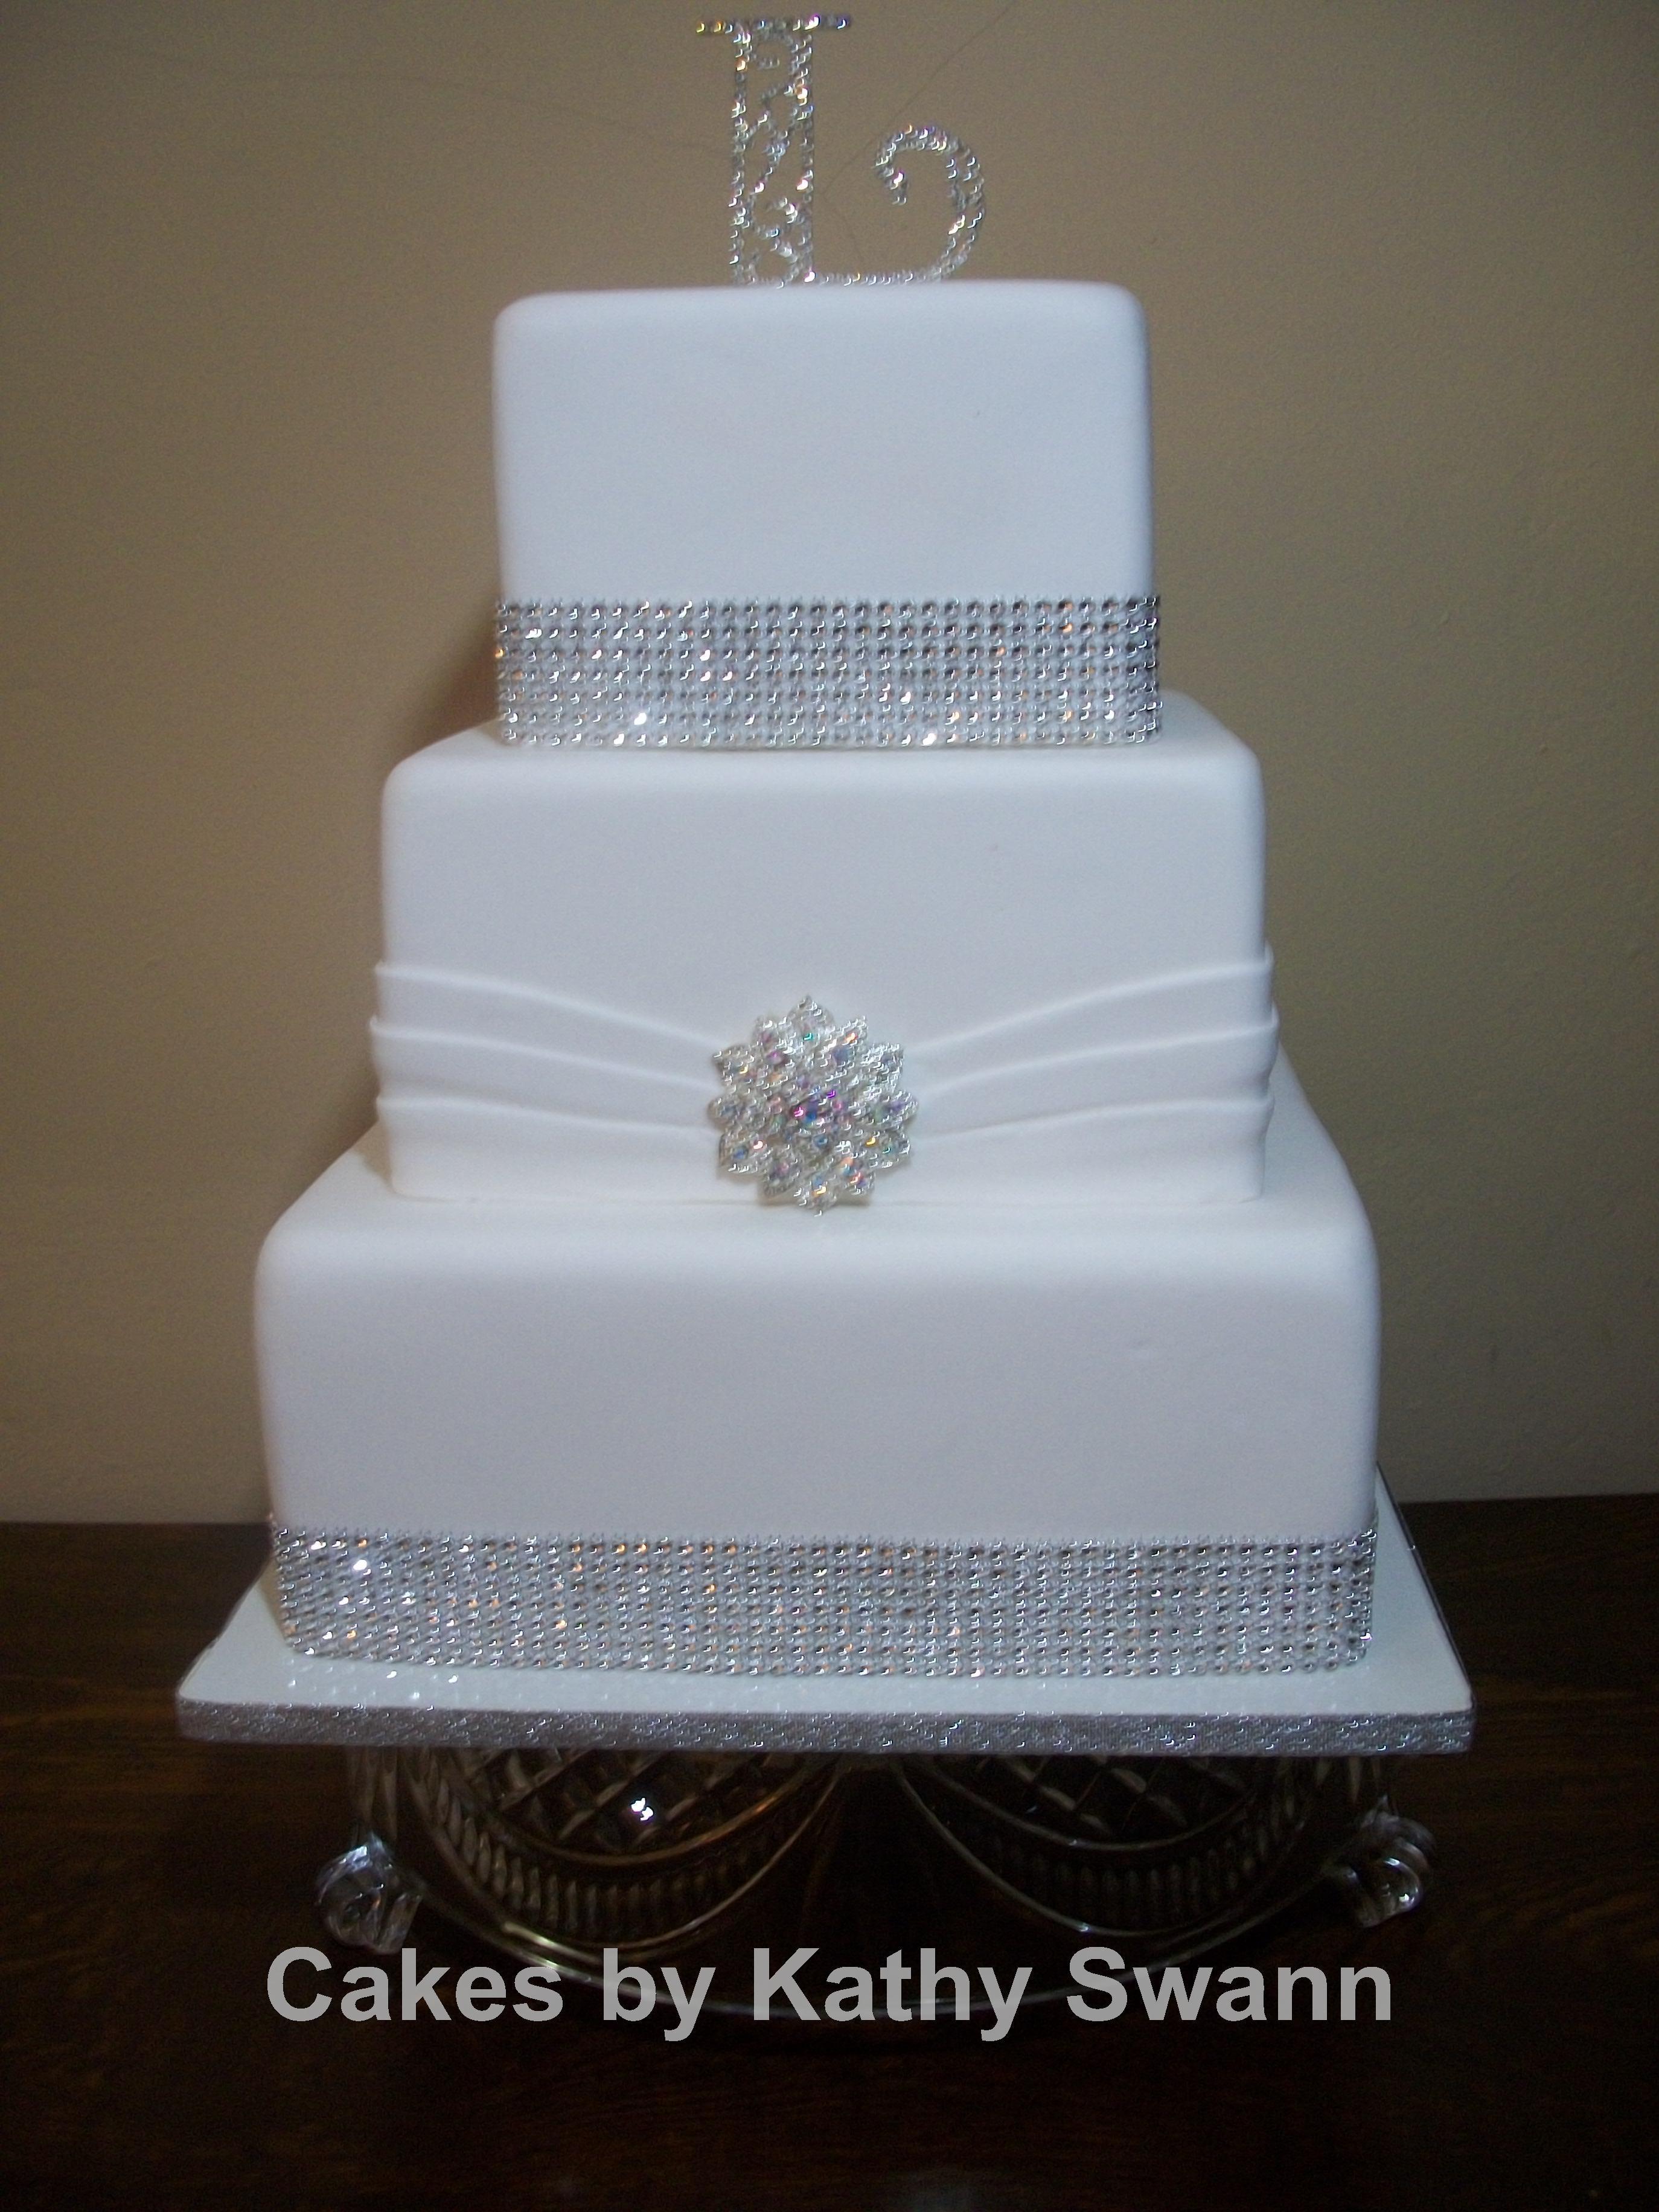 2 Tier Square Wedding Cakes  2 Tier Square Wedding Cakes